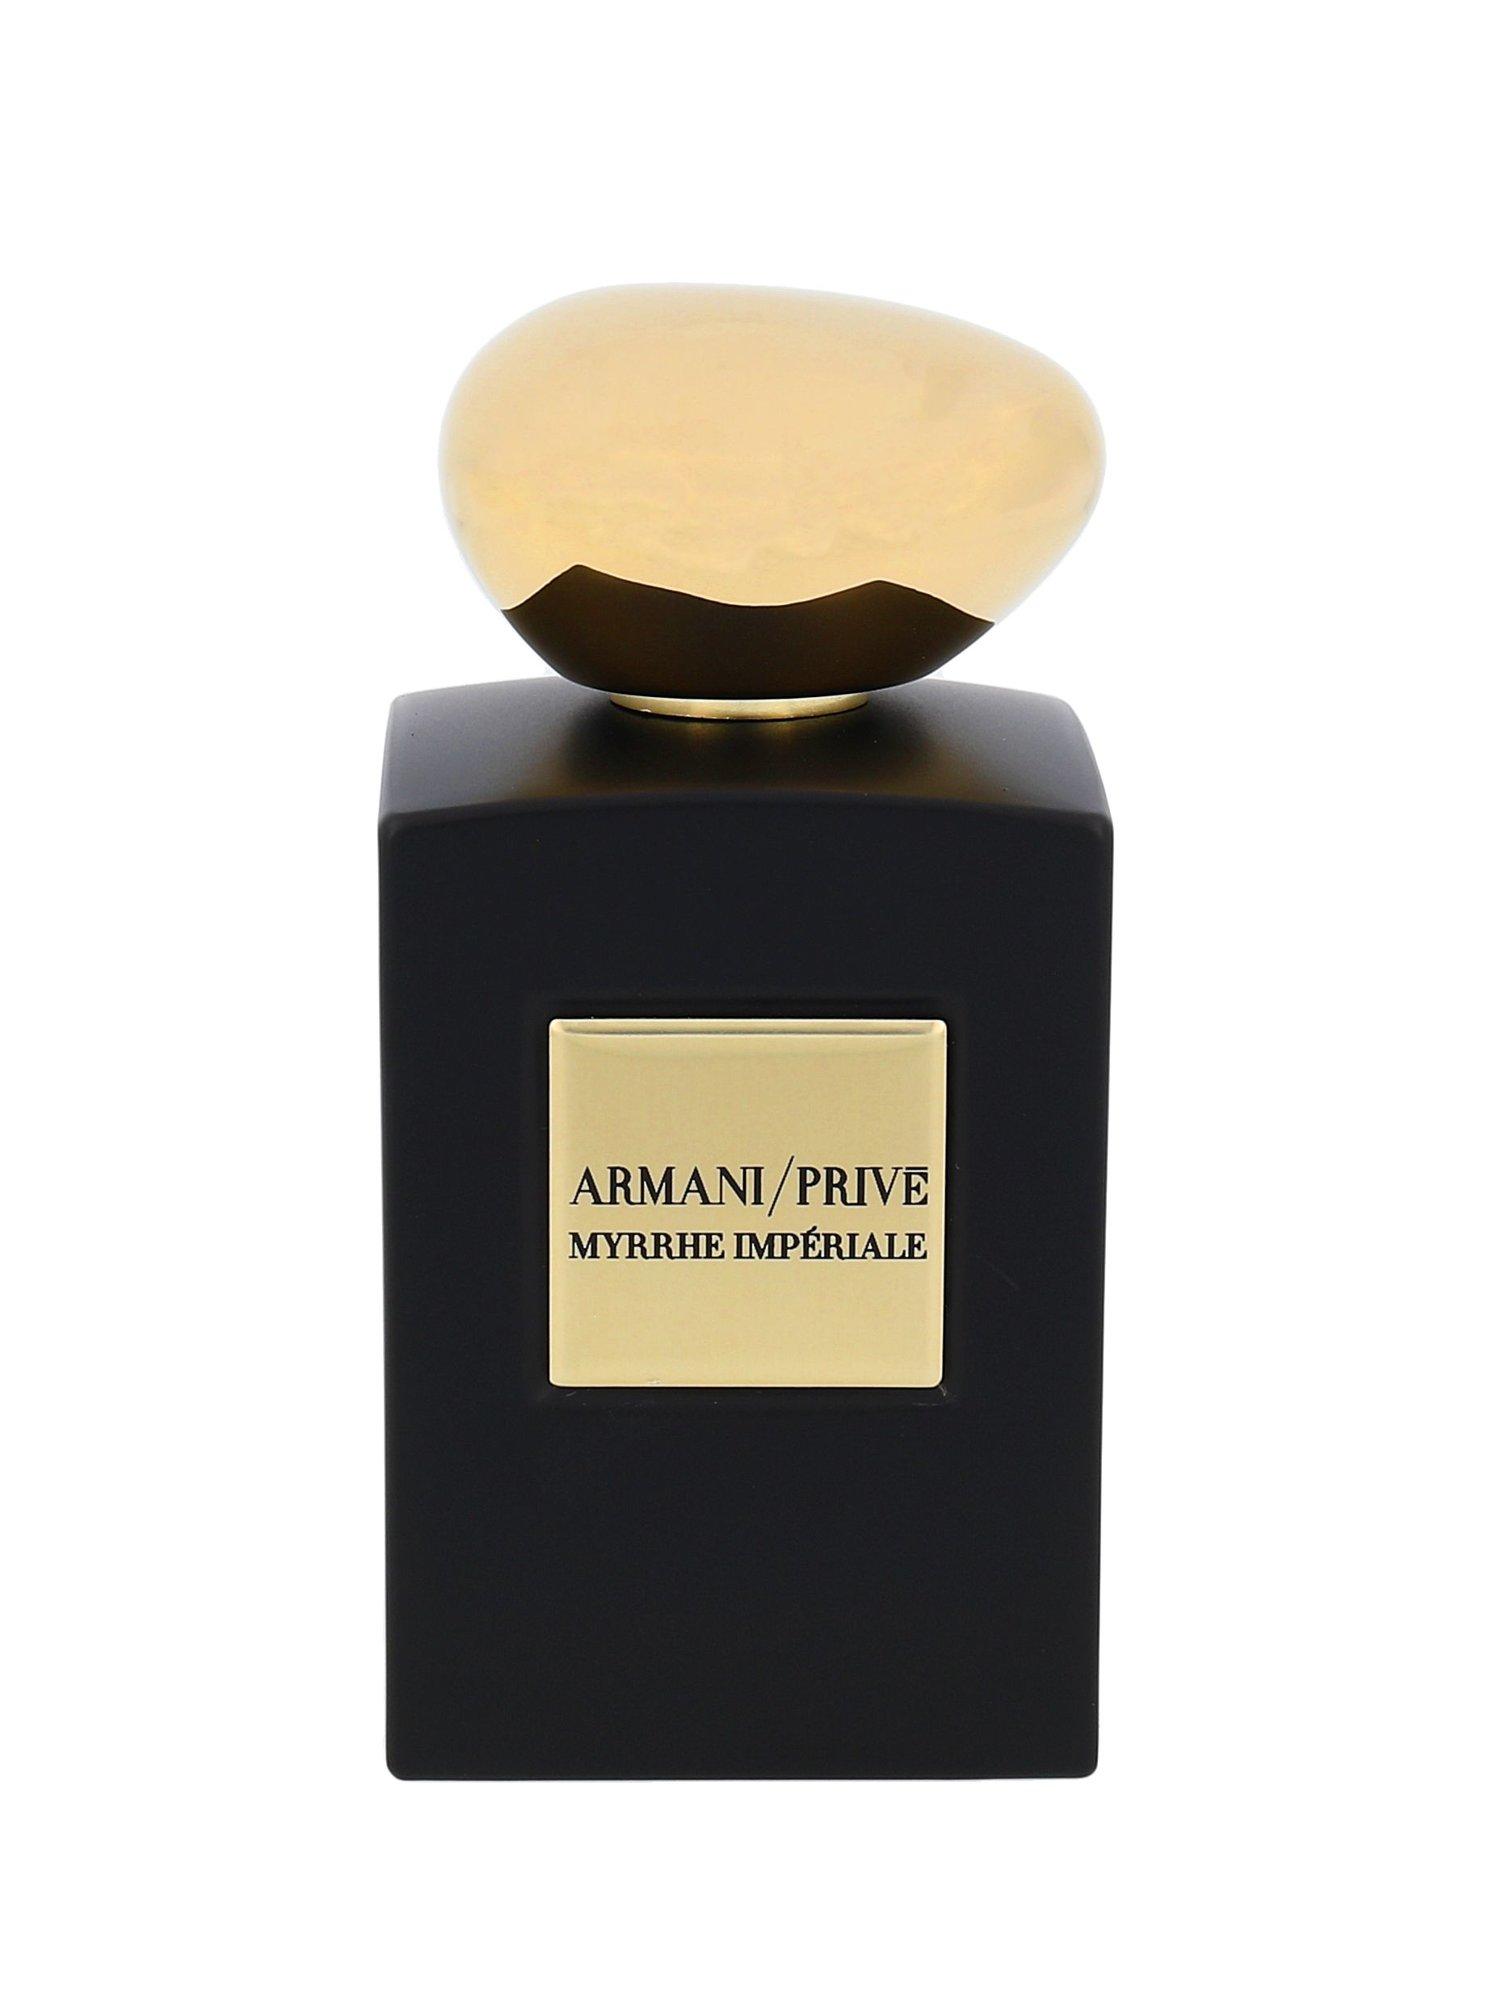 Armani Privé Myrrhe Impériale EDP 100ml  Intense